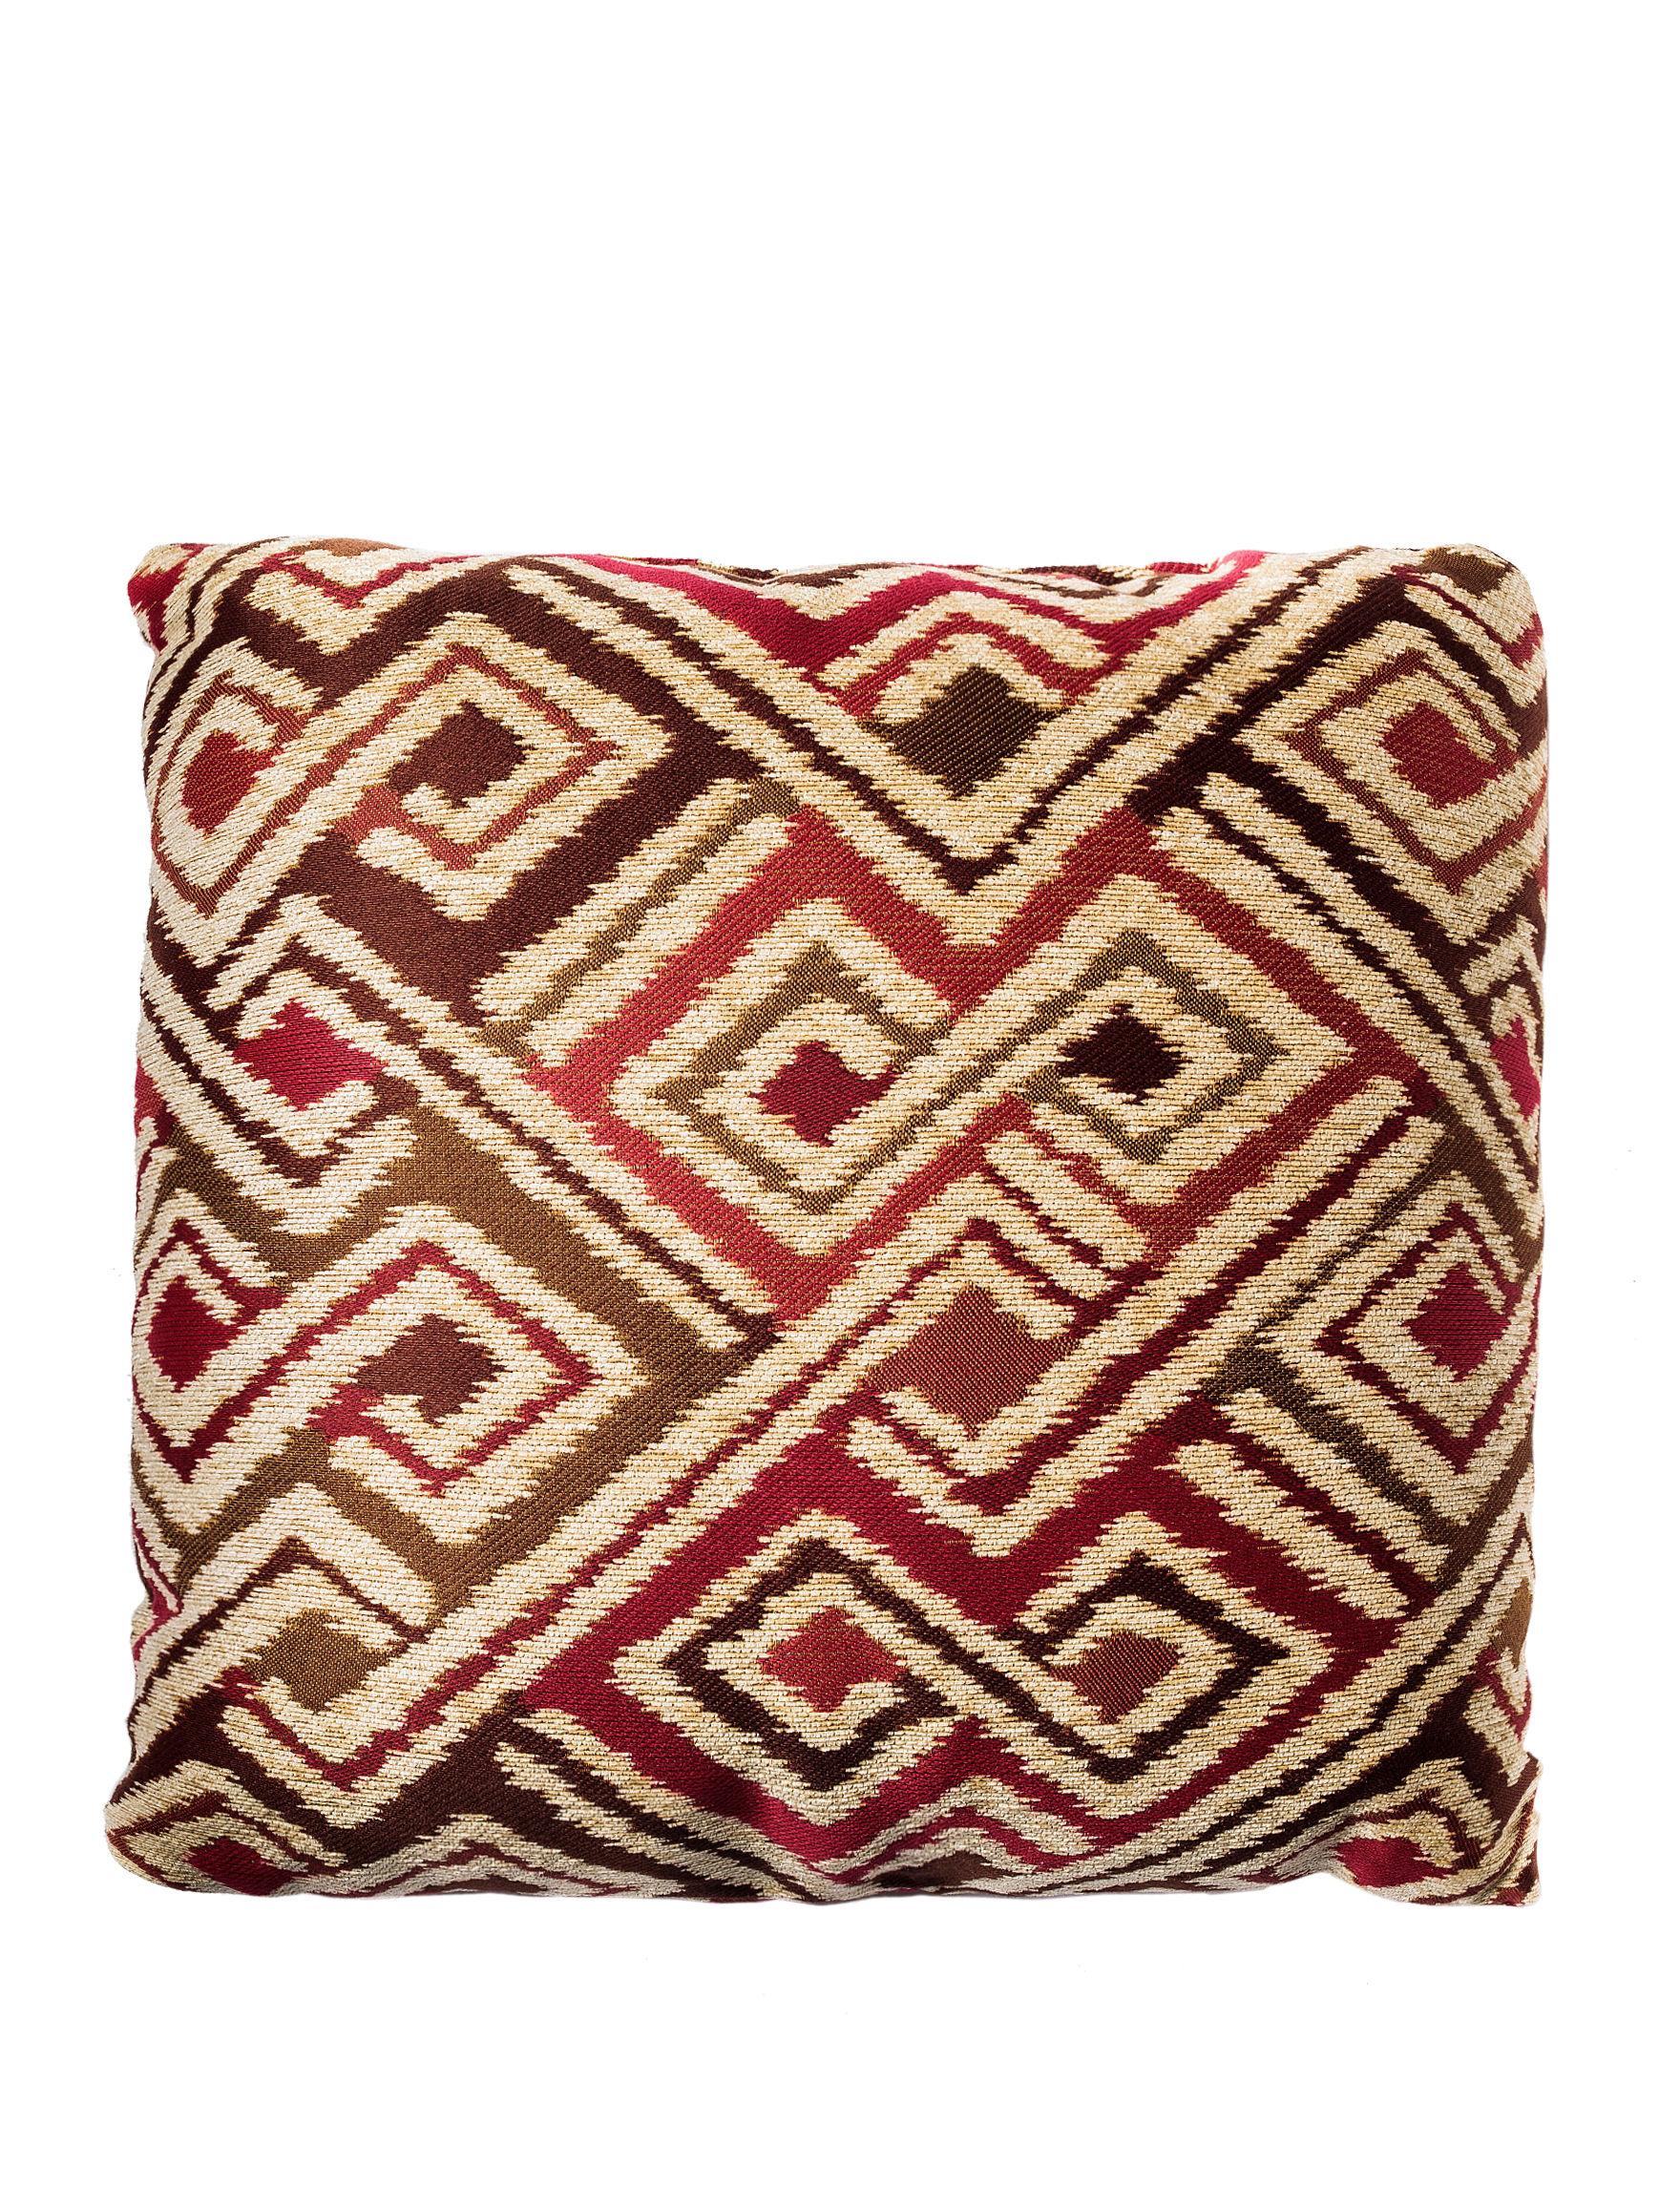 Home Fashions International Burnt Red/ Tan Decorative Pillows